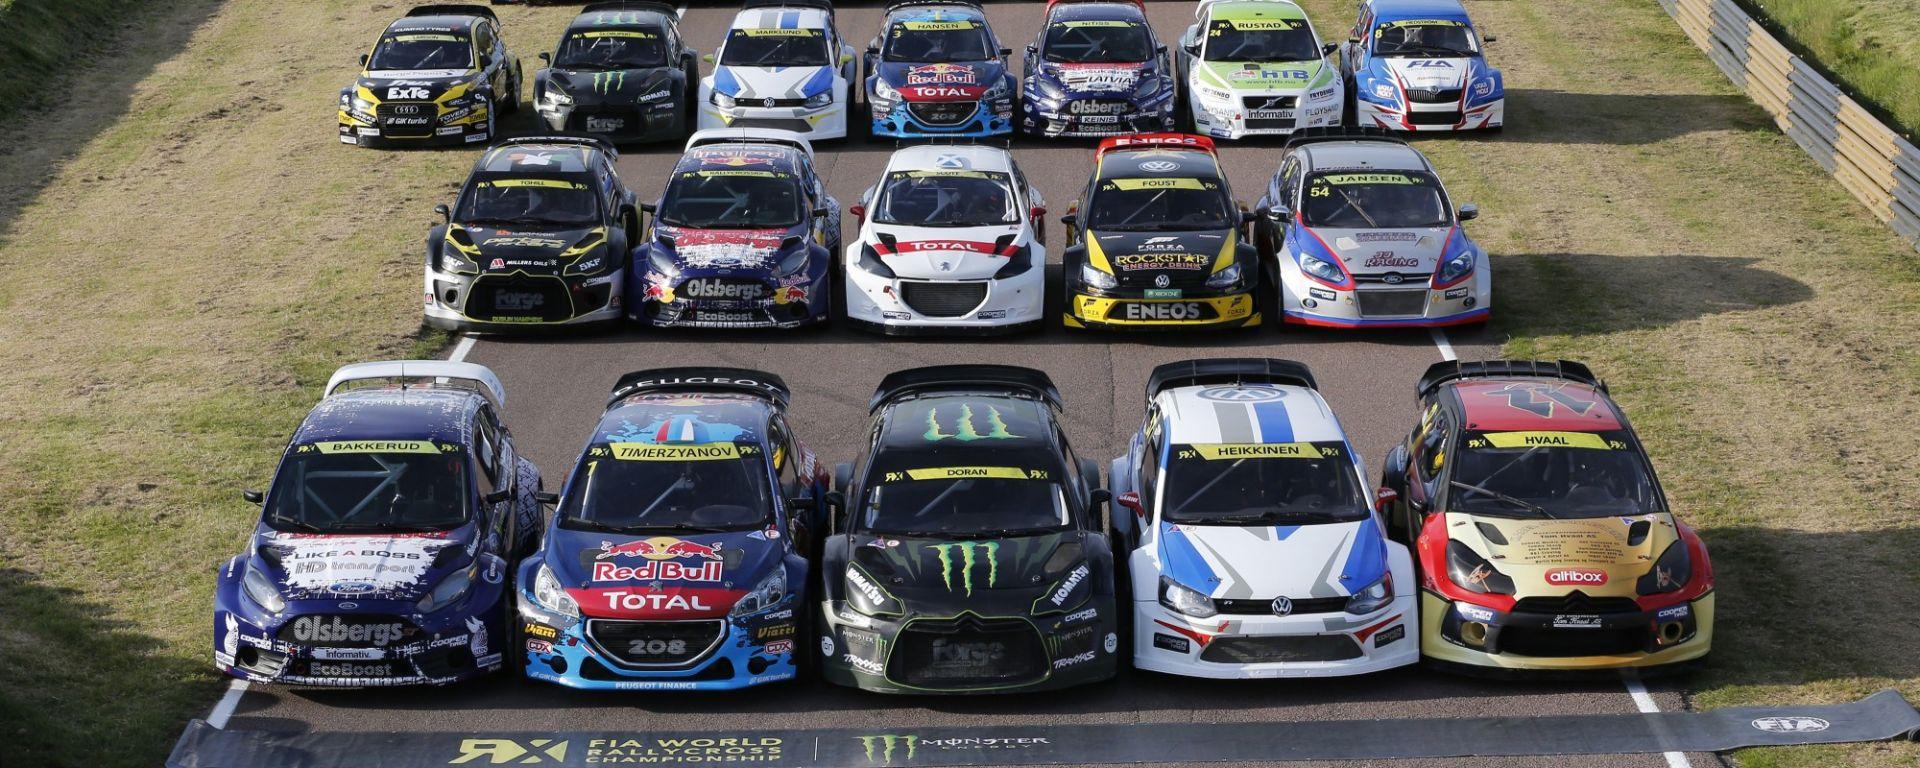 Rallycross 2016 - RD4 Circuito d'Inghilterra - Info